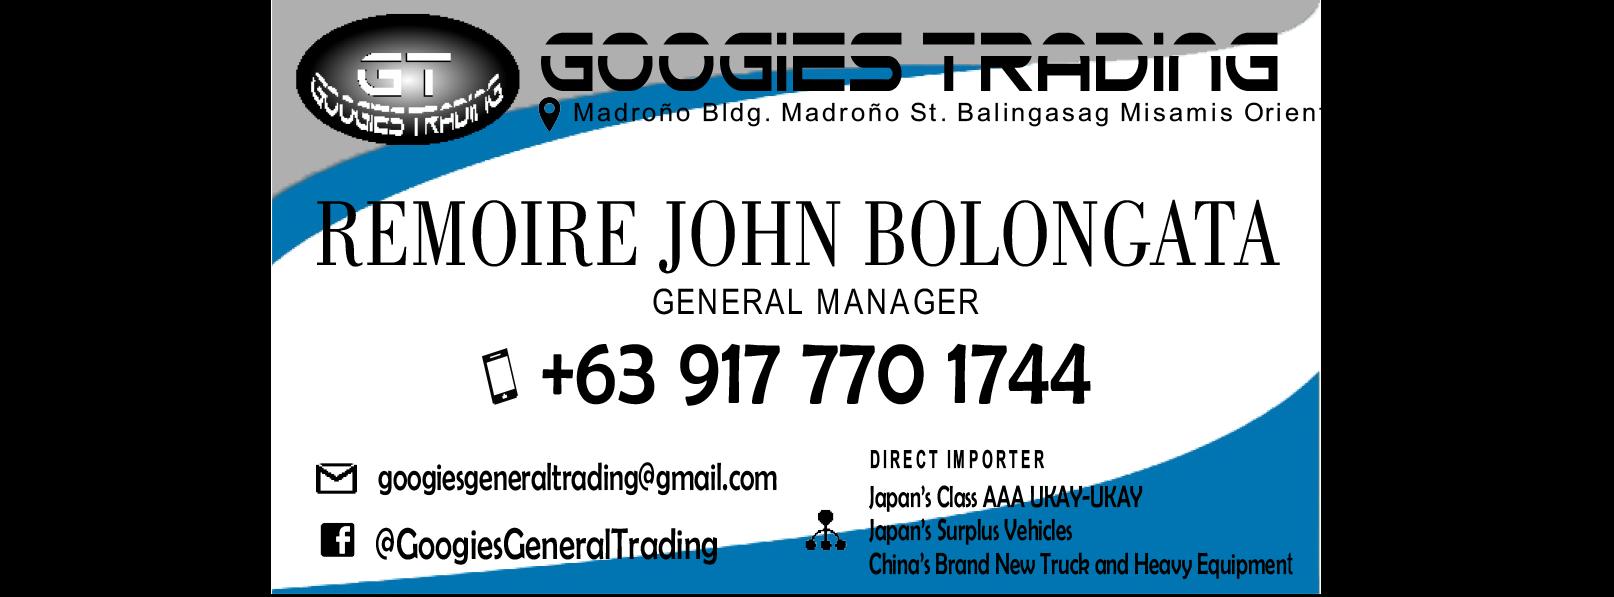 Googies Trading - Vehicles   Cagayandeoro.com